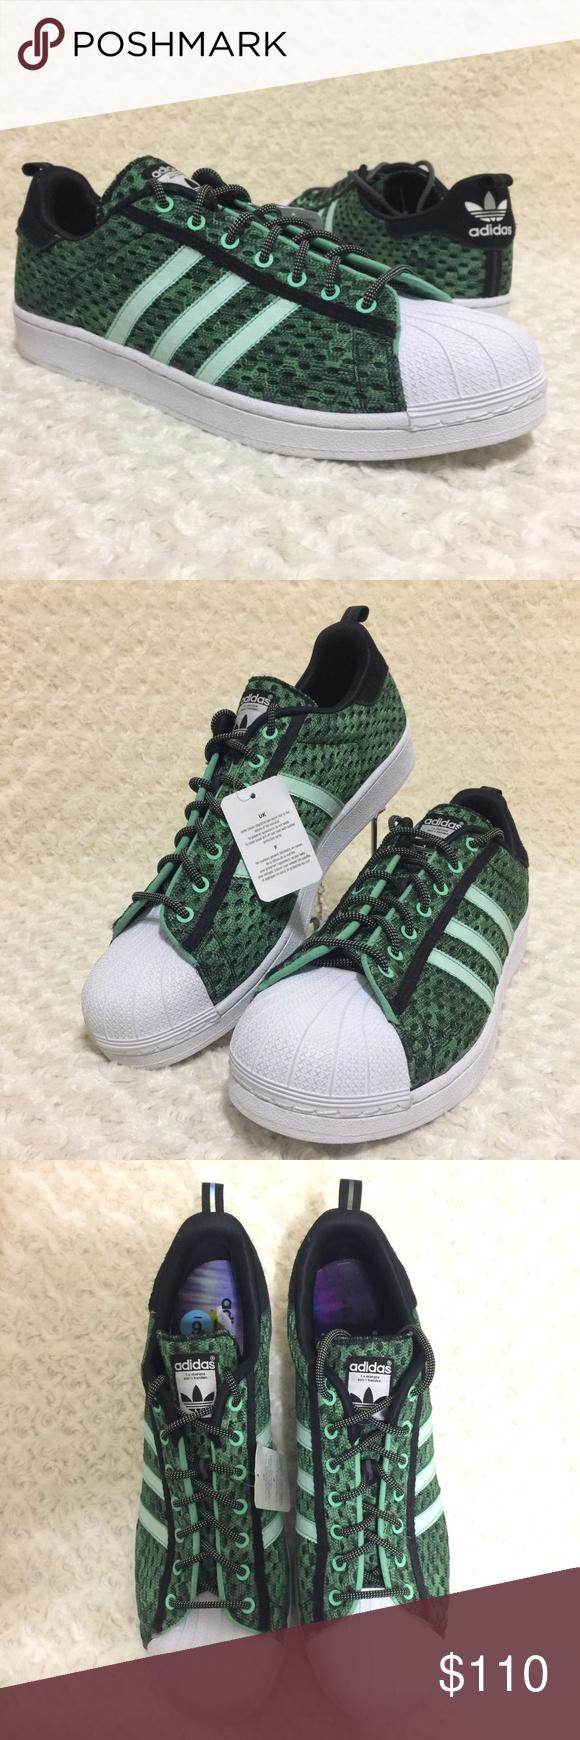 Adidas Superstar Gid Scarpe Originali Shoesf37671 Stile Leggero